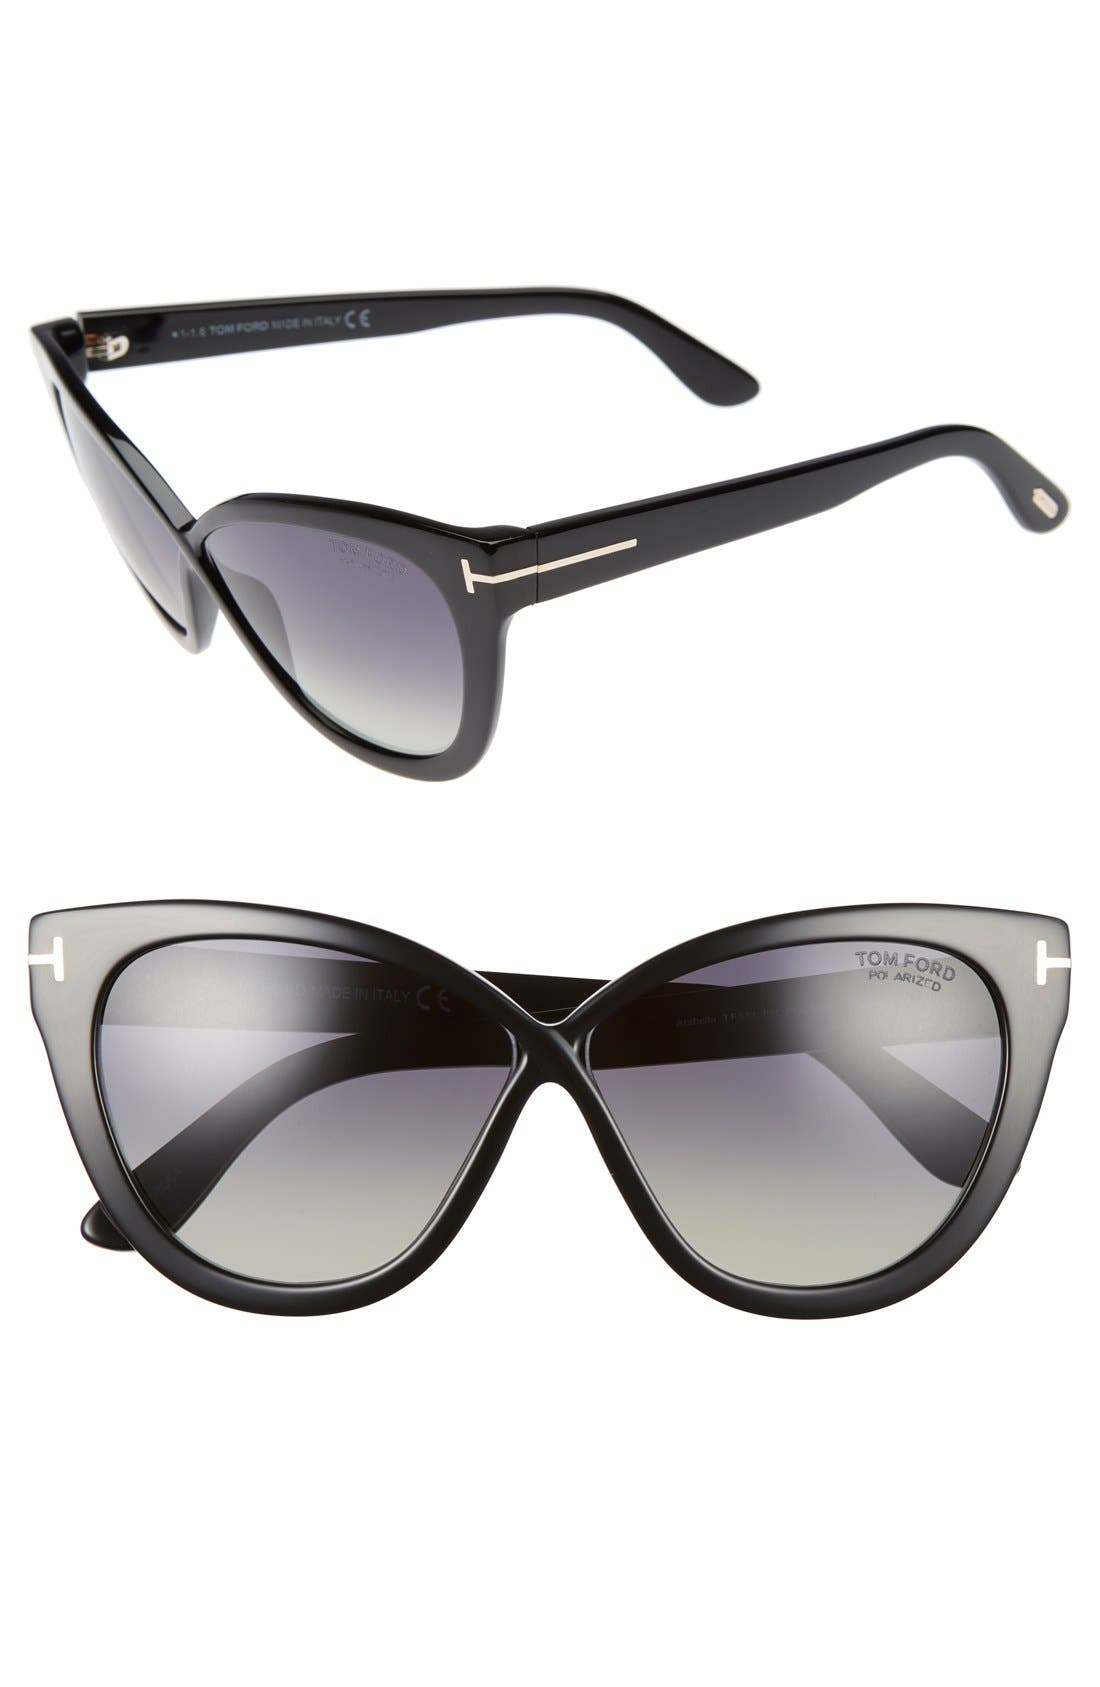 Arabella 59mm Cat Eye Sunglasses,                         Main,                         color, Black/ Polar Gradient Smoke